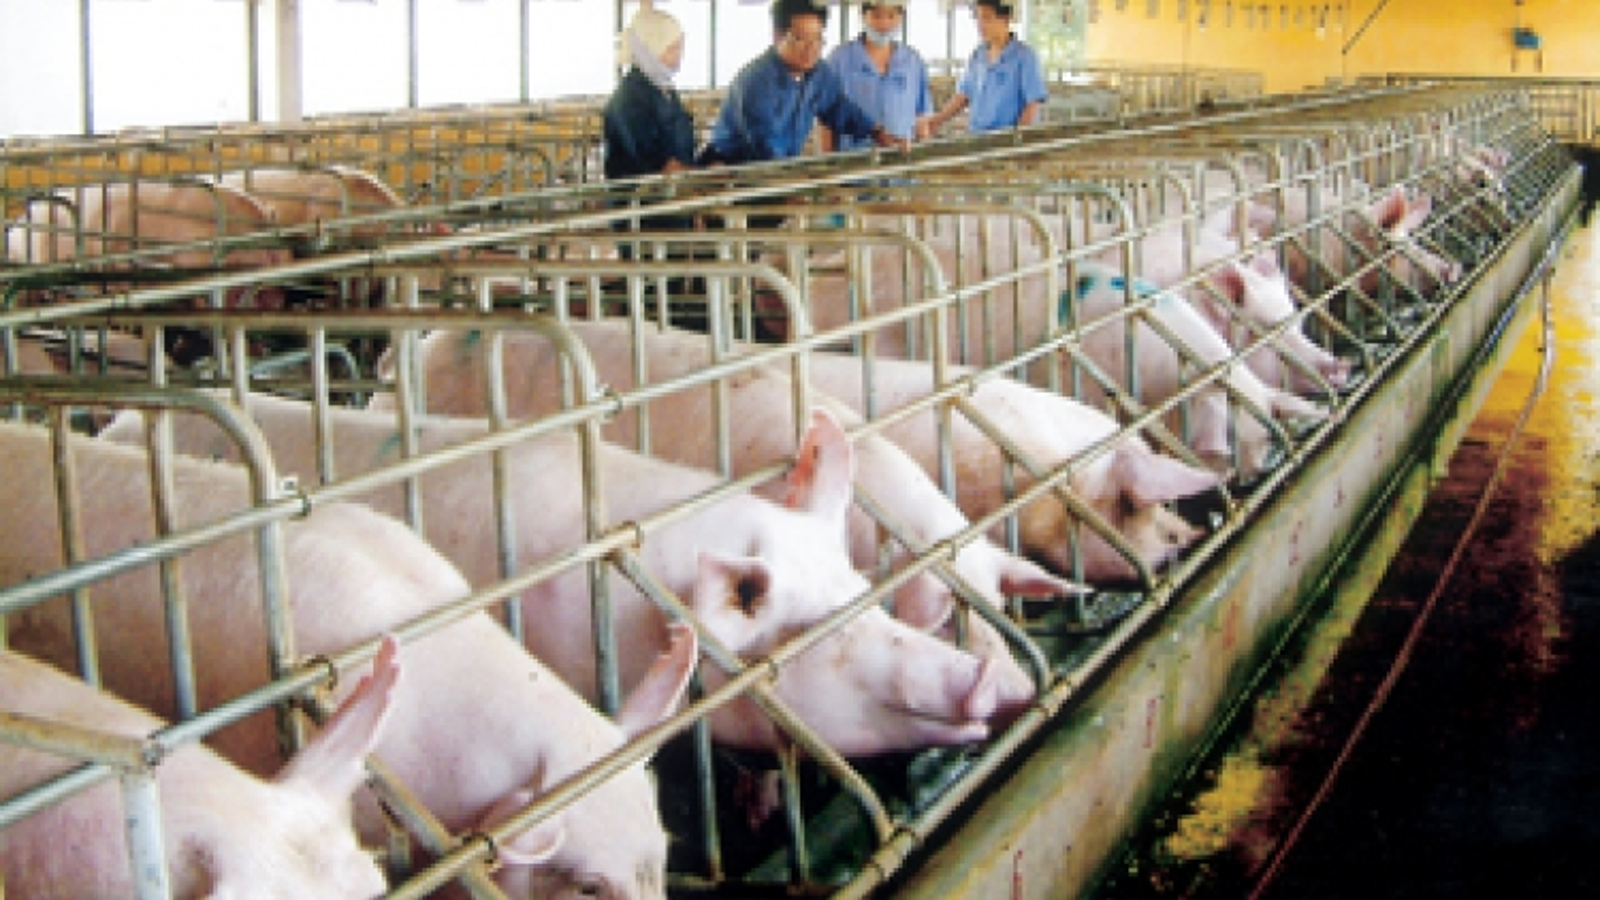 African swine flu likely to enter Vietnam